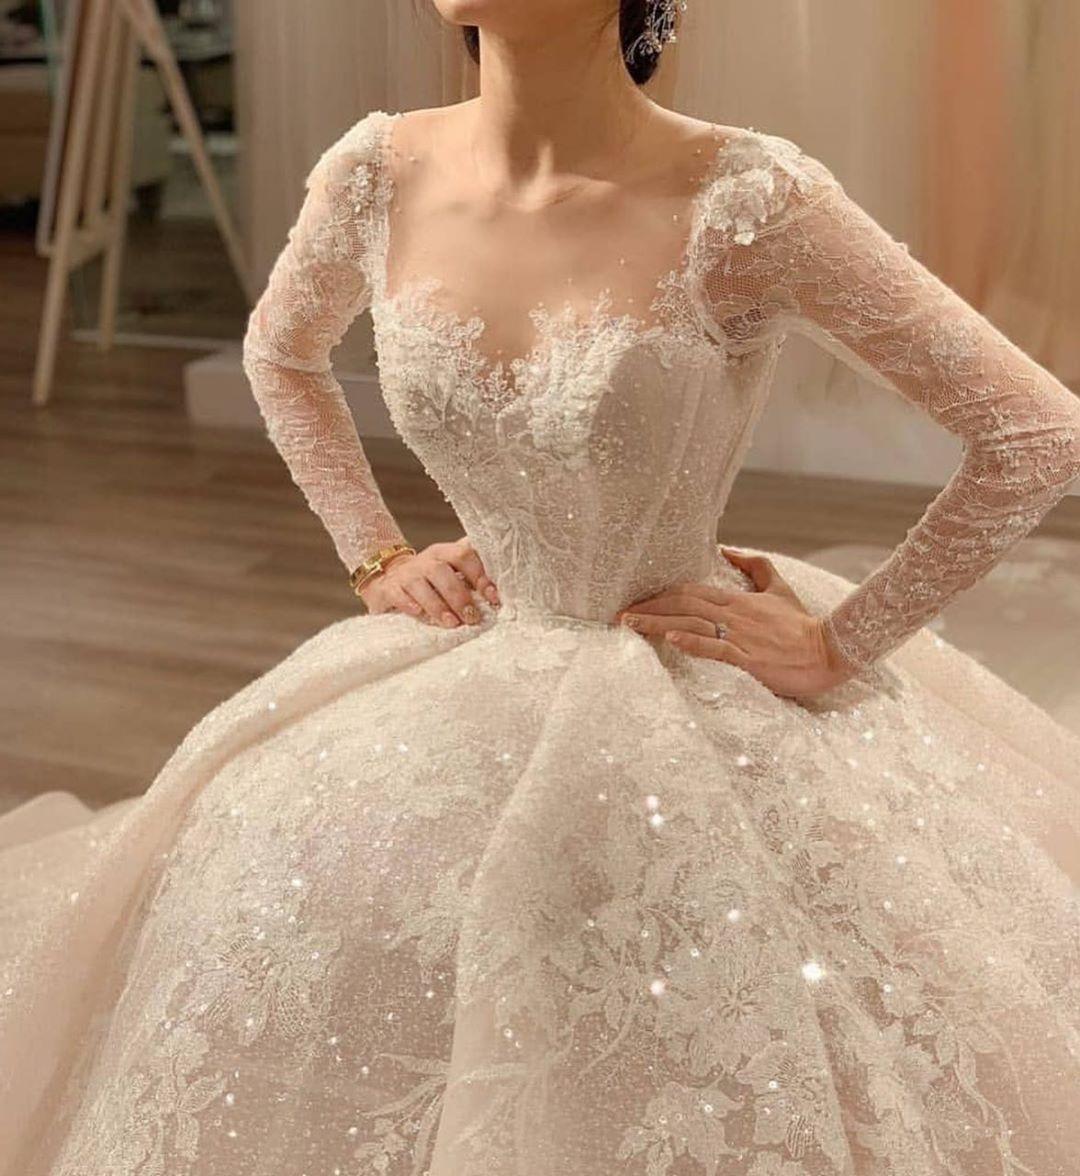 En Guzeli الأجمل On Instagram اجمل فستان عروس شفته بكل حياتي فستان الاحلام ولا غلطه Ball Gowns Wedding Wedding Dresses Bridal Dresses